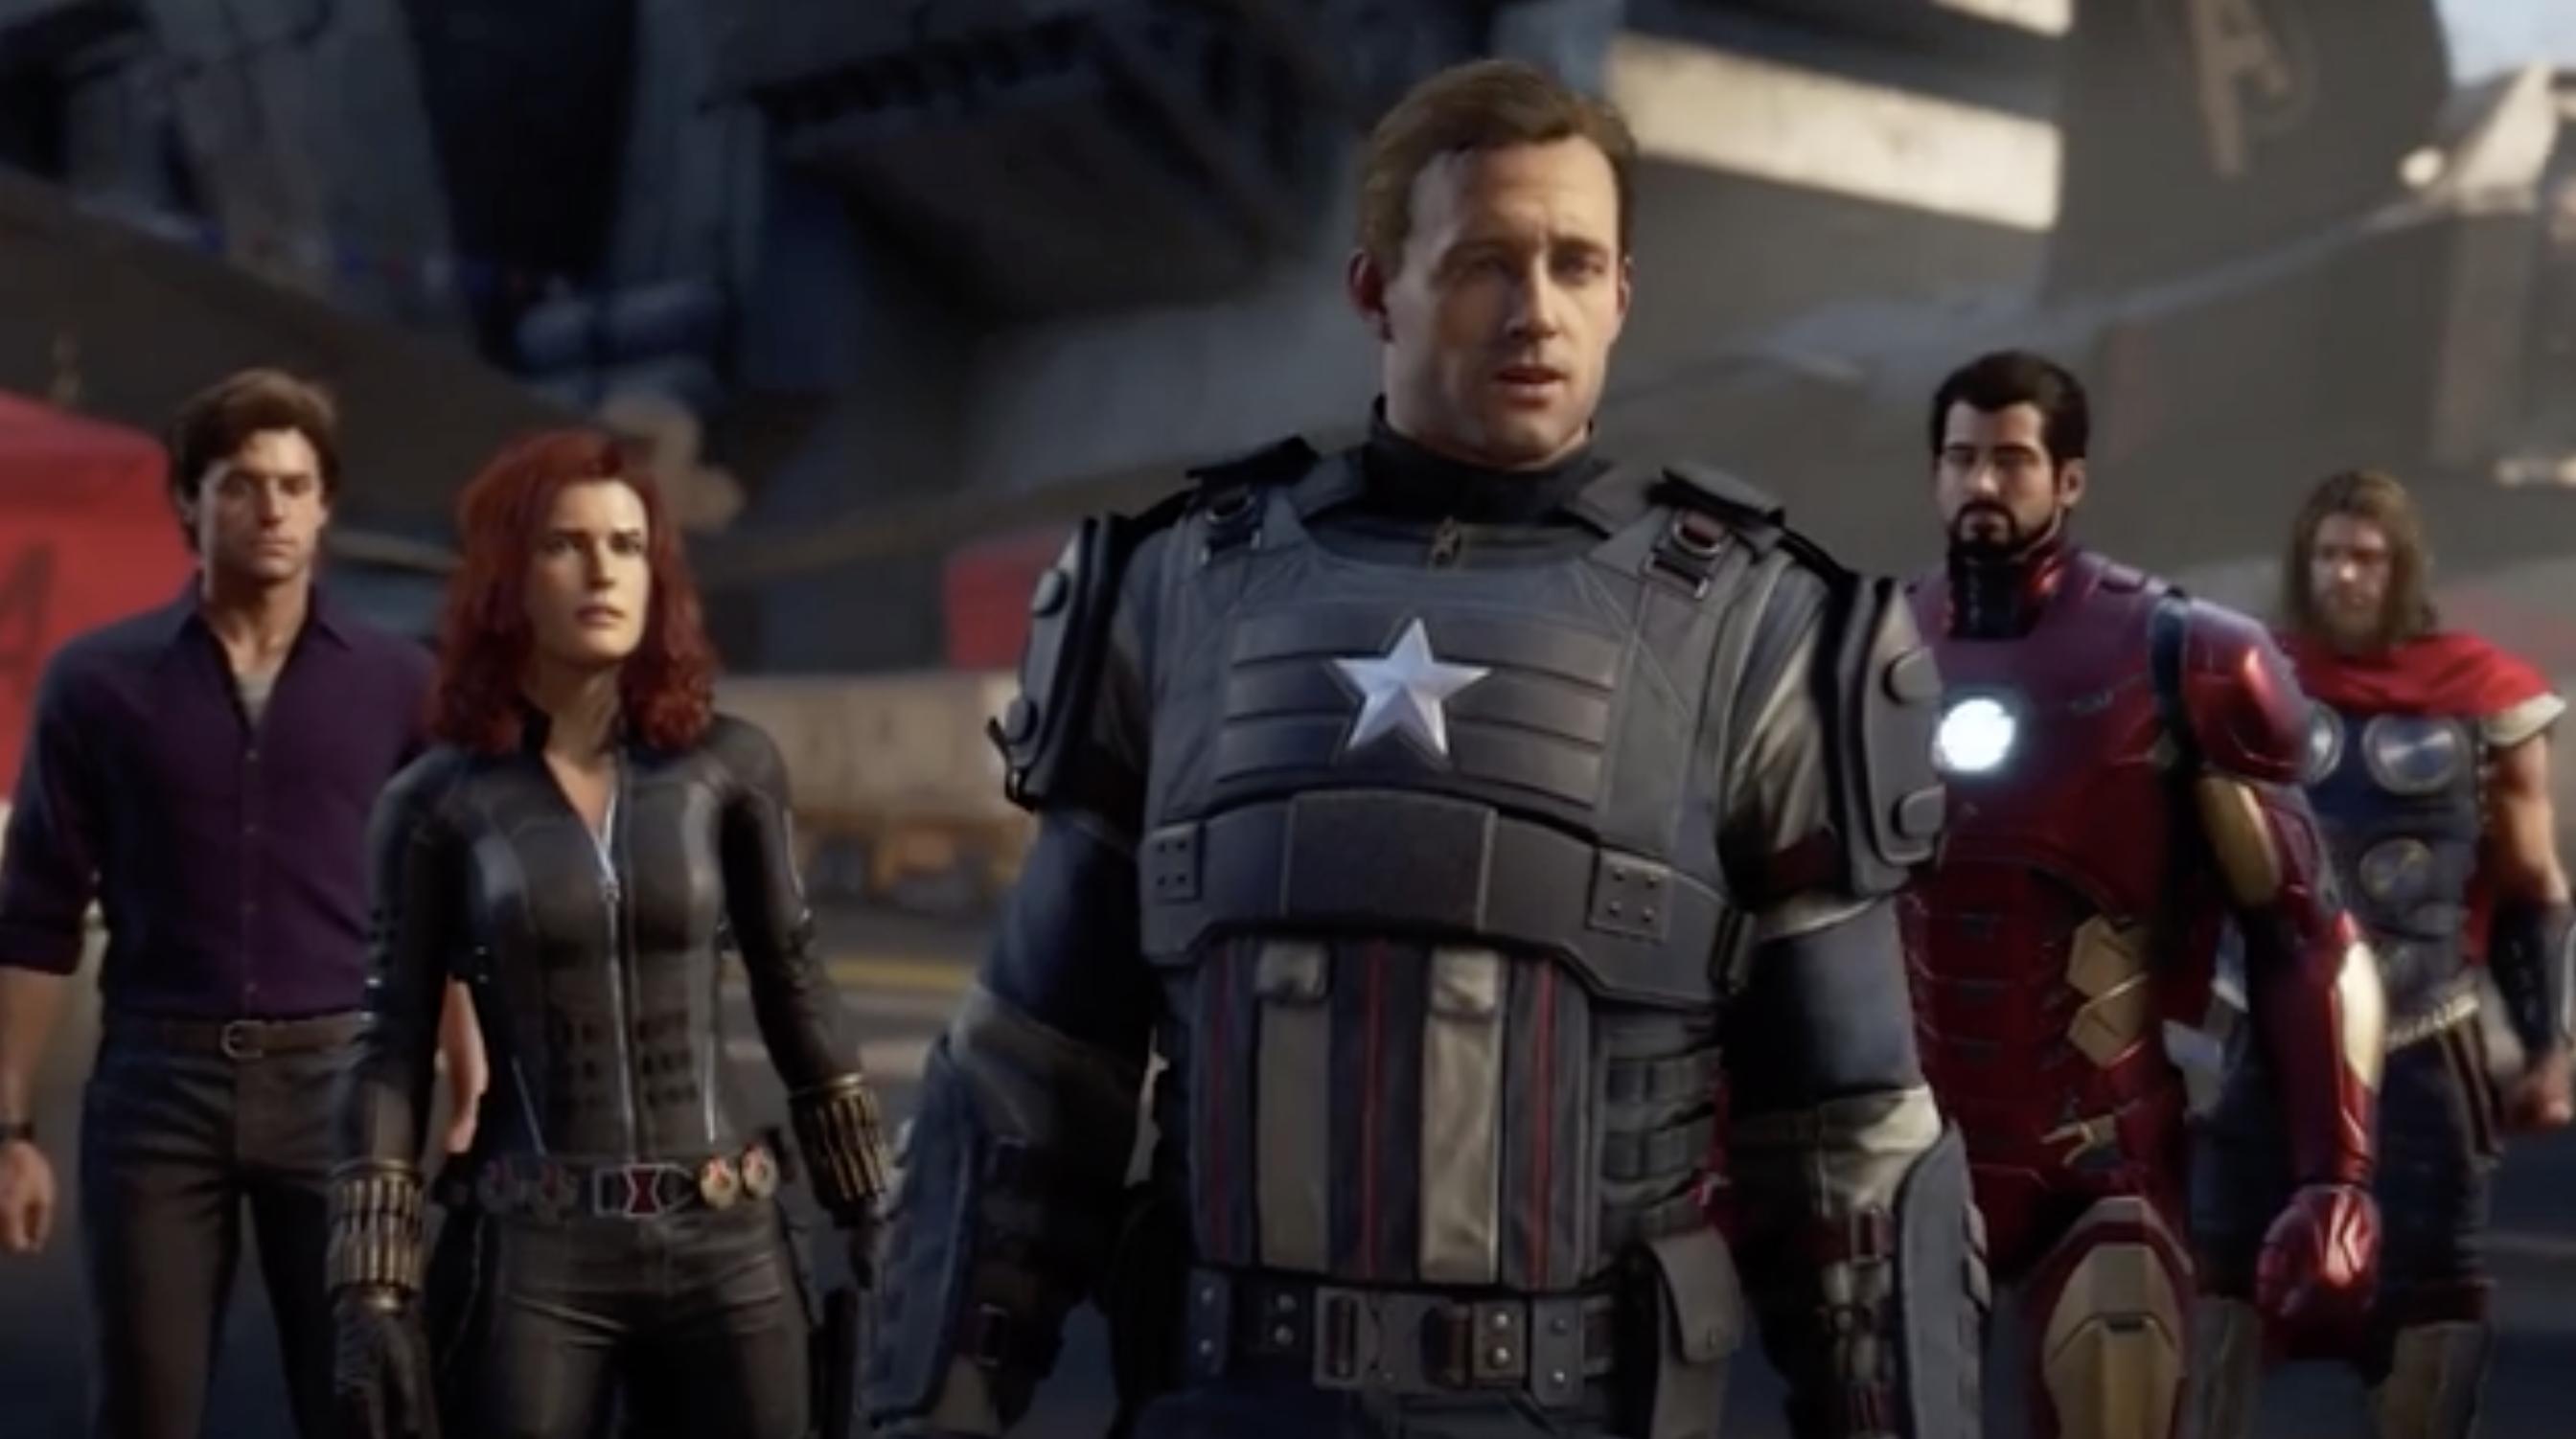 Embrace Your Powers As Square Enix And Marvel Entertainment Assemble Marvel's Avengers